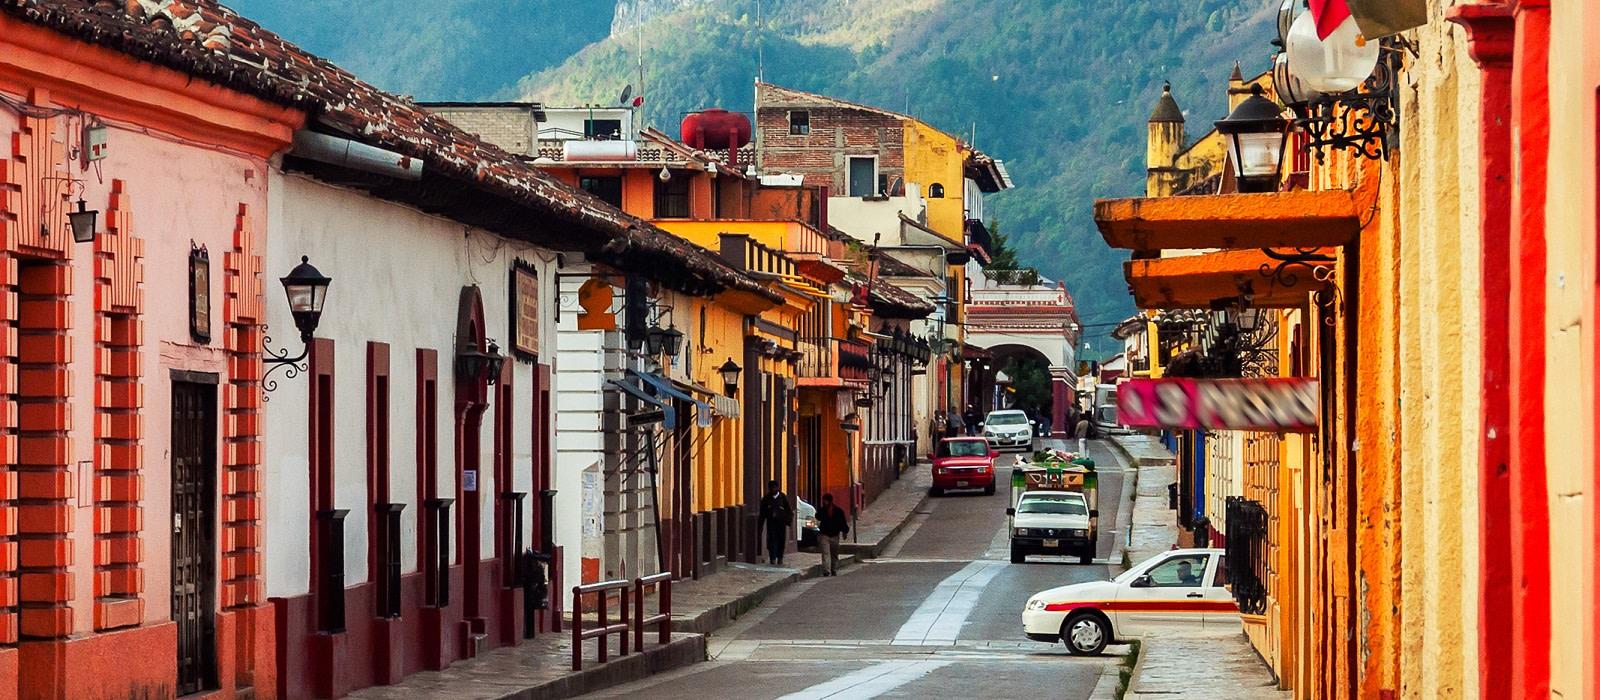 Straße mit bunten Häusern in San Cristobal in Mexikos Kulturhauptstadt Chiapas